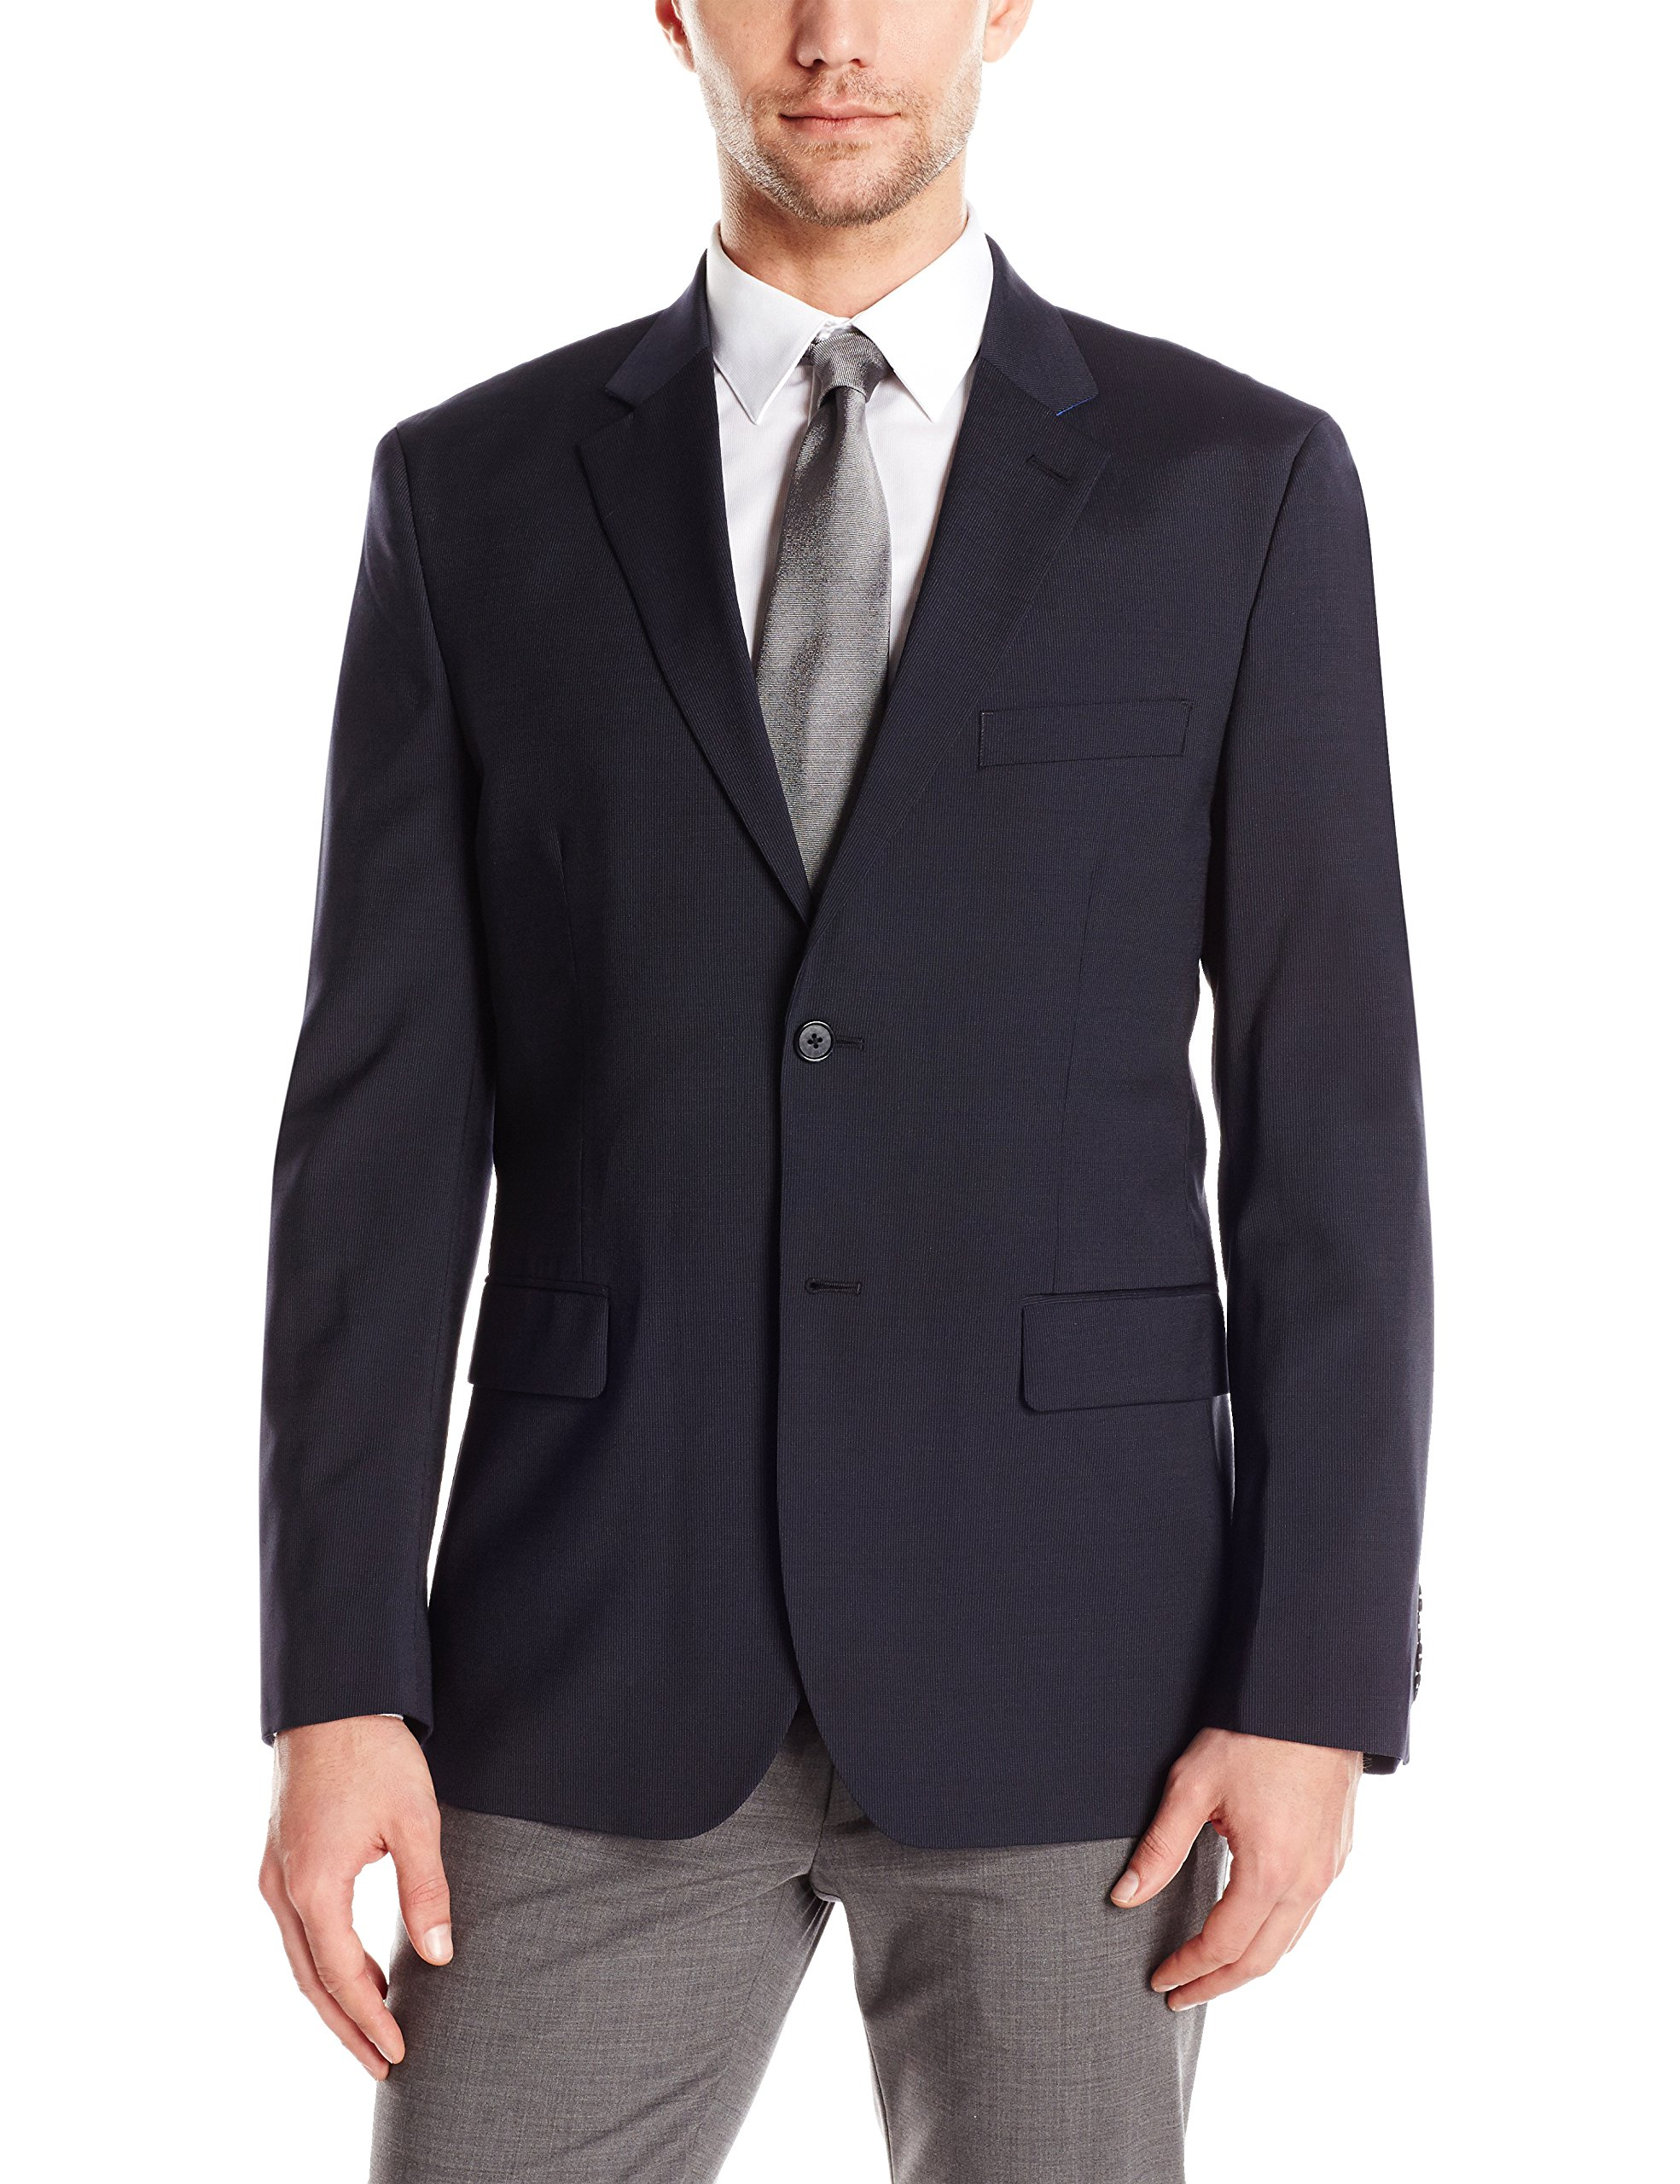 Nautica Men's Performance Wool Suit Separate Jacket, Navy, 44 Regular